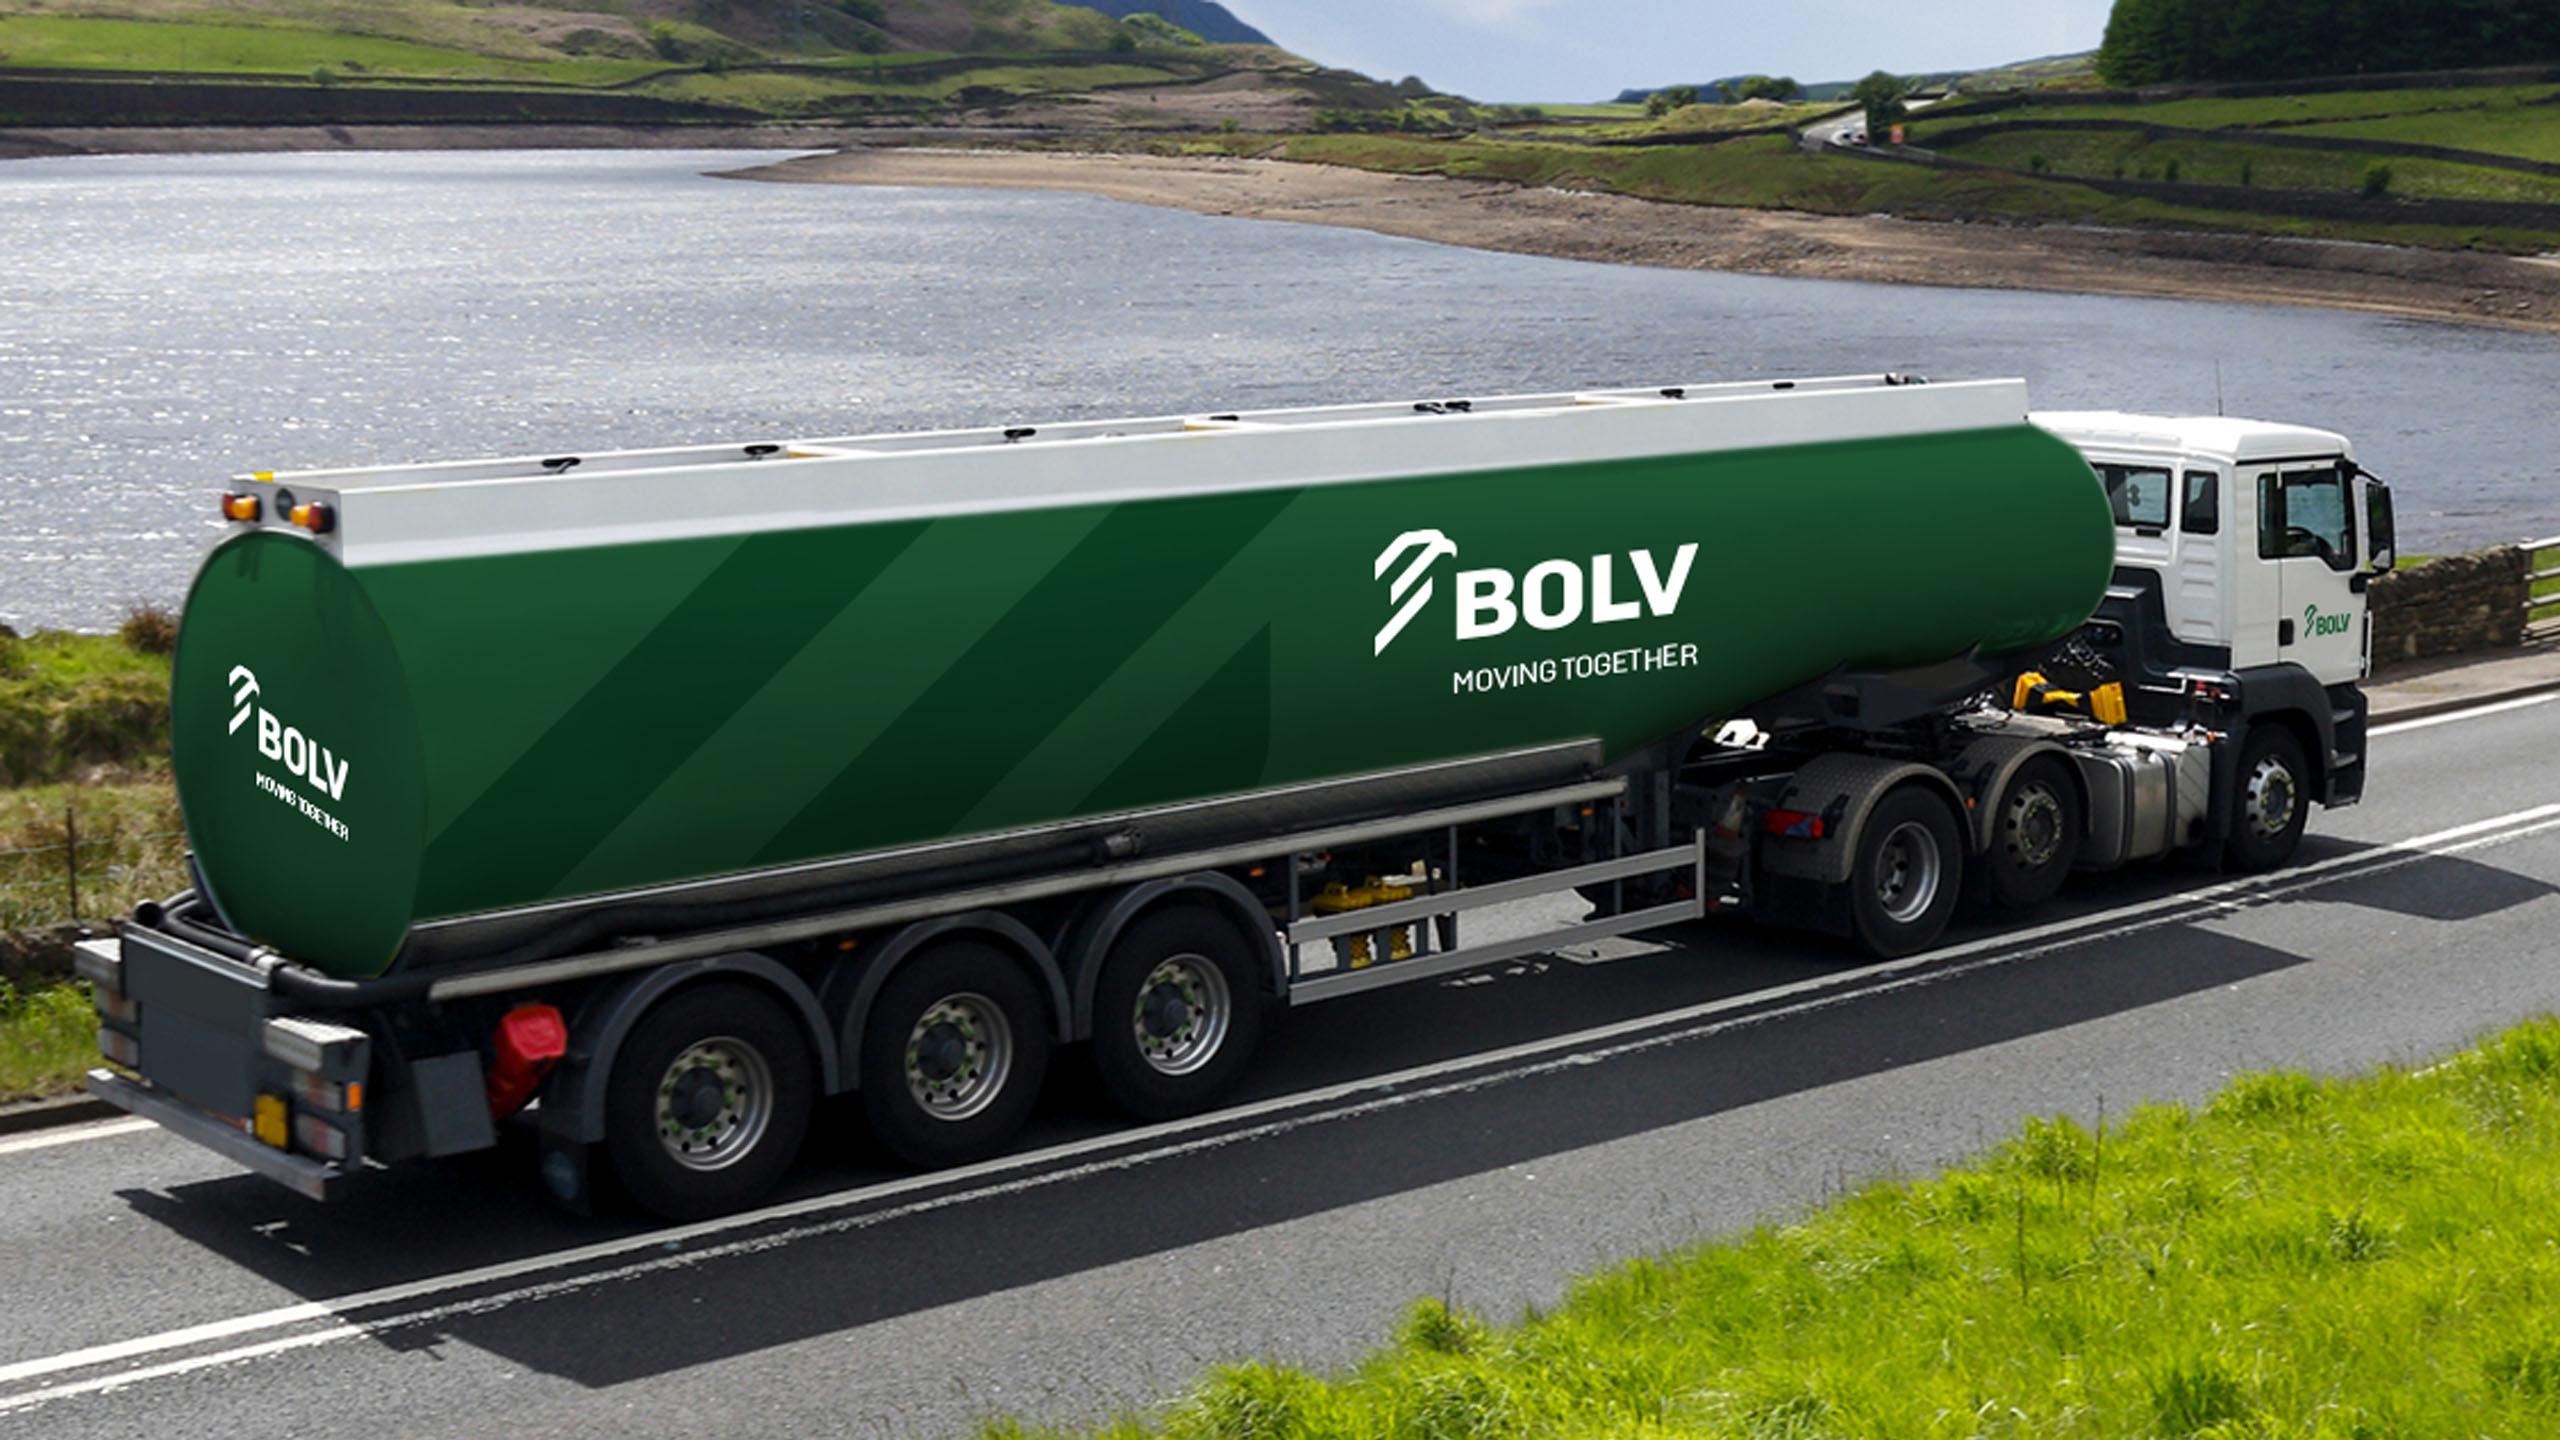 Bolv Group Project Img 7 - Vatra Agency / Founder & CEO Gerton Bejo